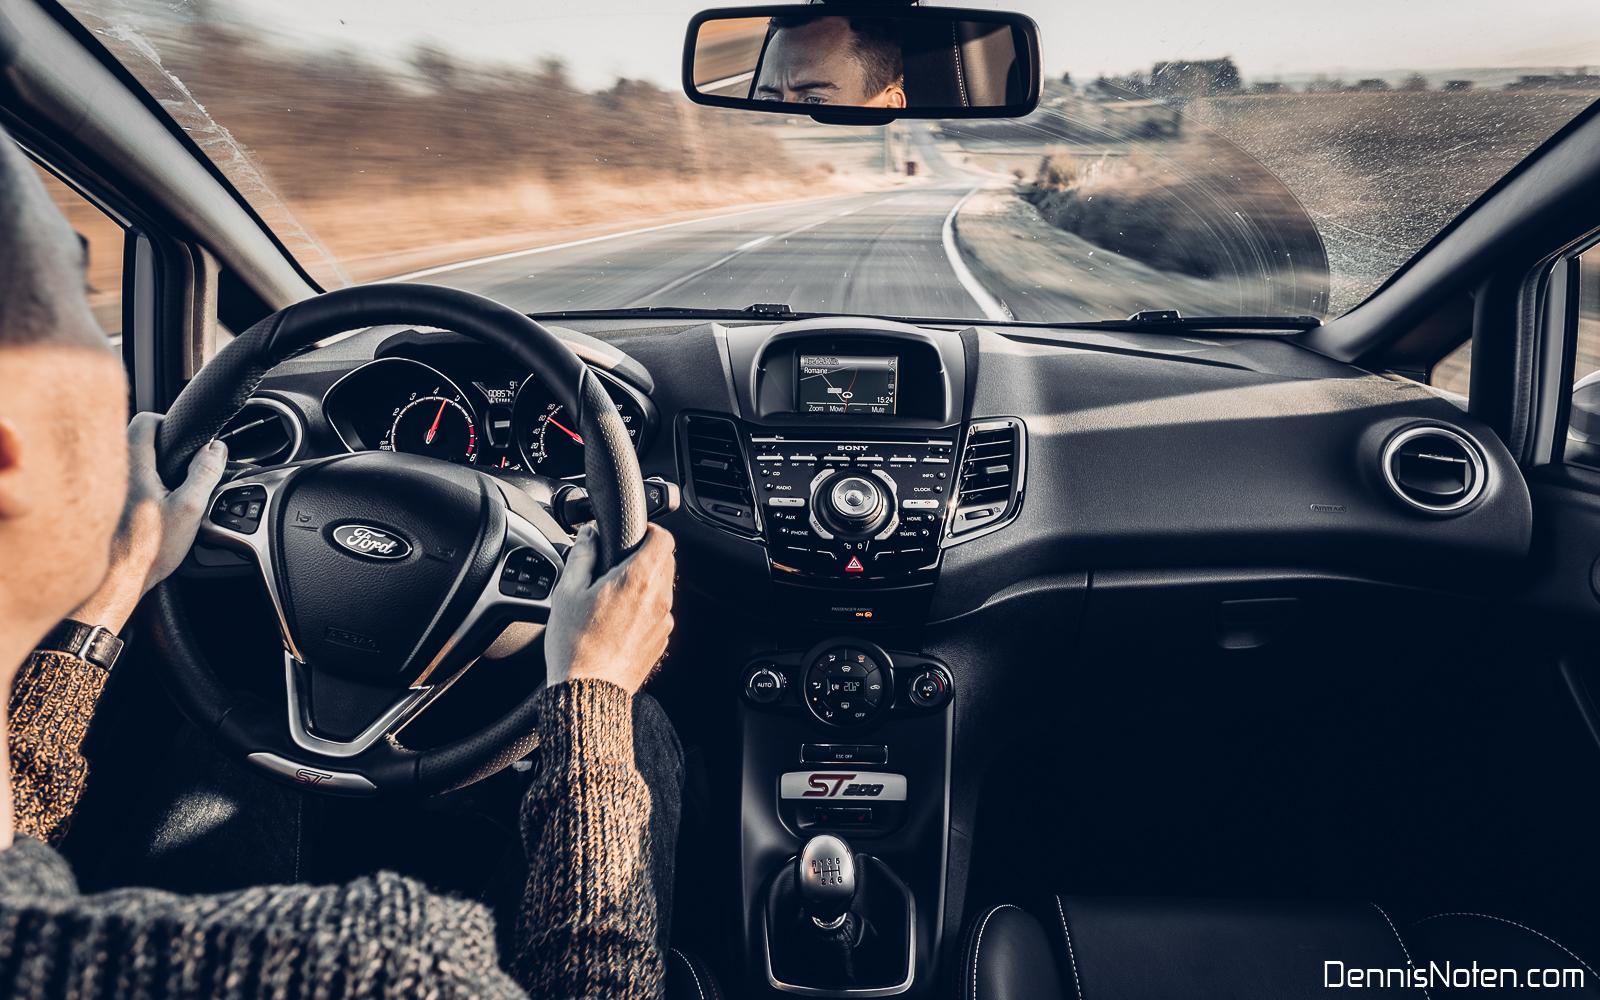 Ford Fiesta ST200 by Dennisnoten.com Photography